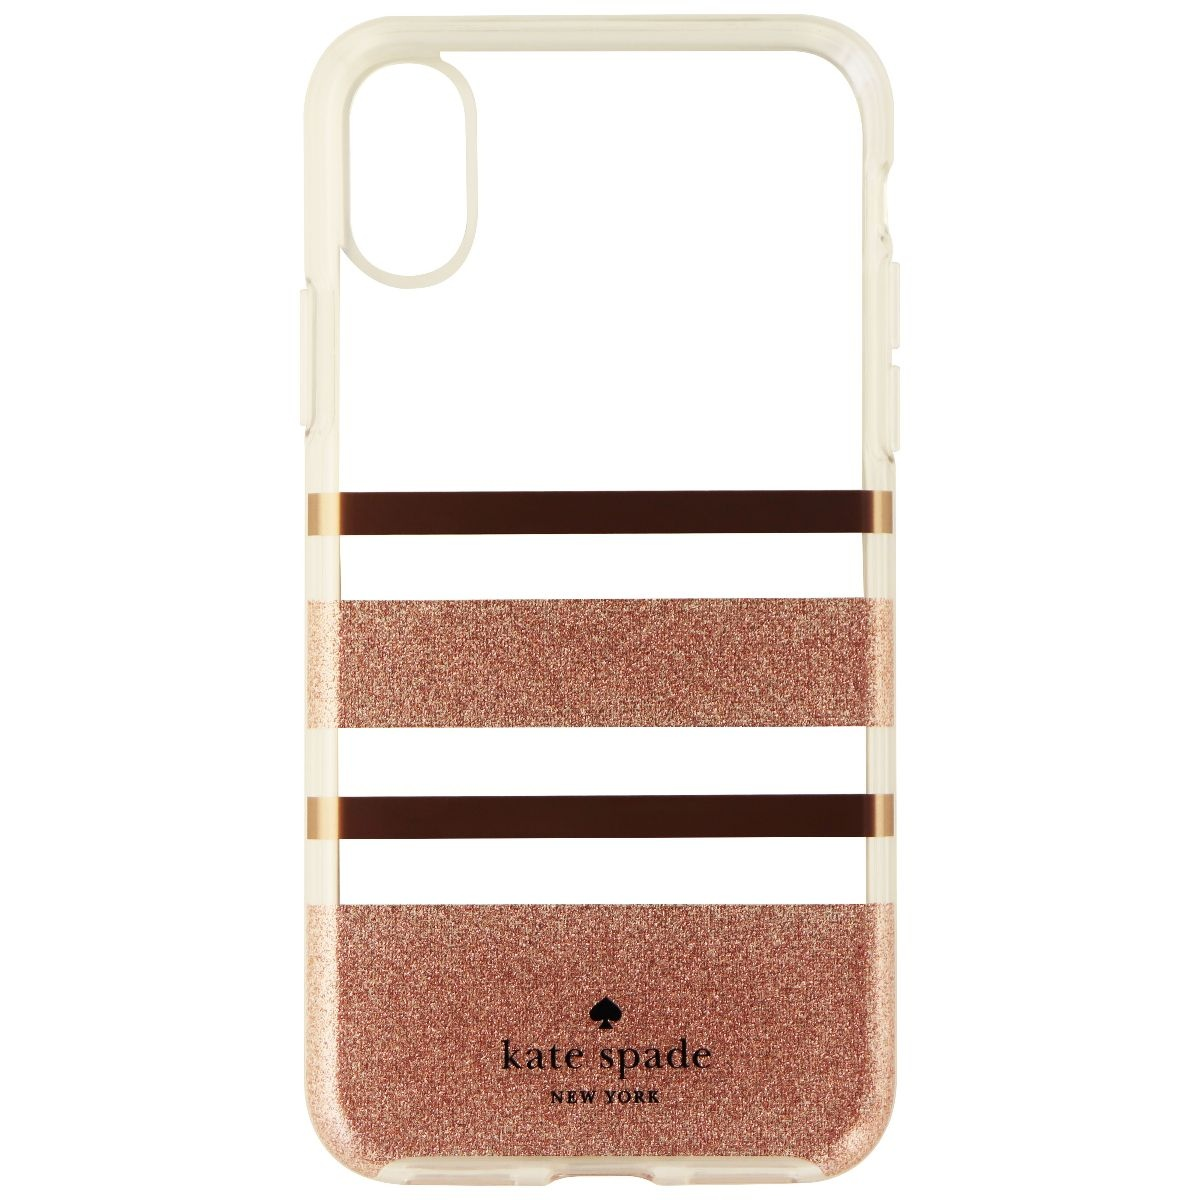 Kate Spade Flexible Hard Case for iPhone X 10 - Clear/Rose Gold/Glitter Stripe